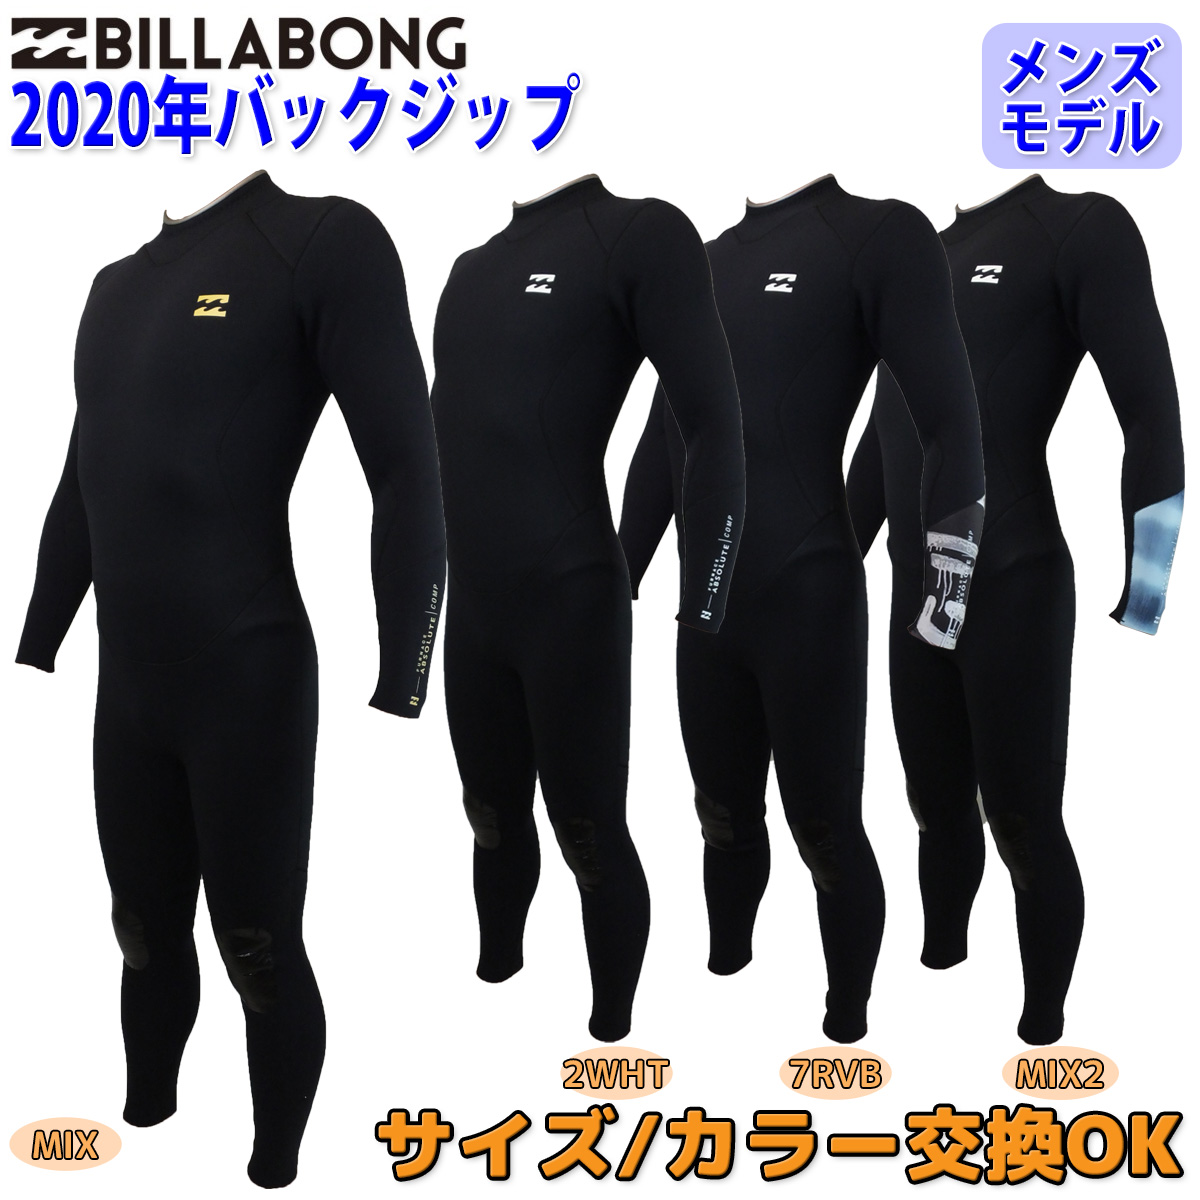 20 BILLABONG ビラボン フルスーツ ウェットスーツ ウエットスーツ バックジップ バリュー 3ミリ 春夏用 メンズモデル 2020年 SUPER FLEX マテリアル仕様品番BA018-006 日本正規品